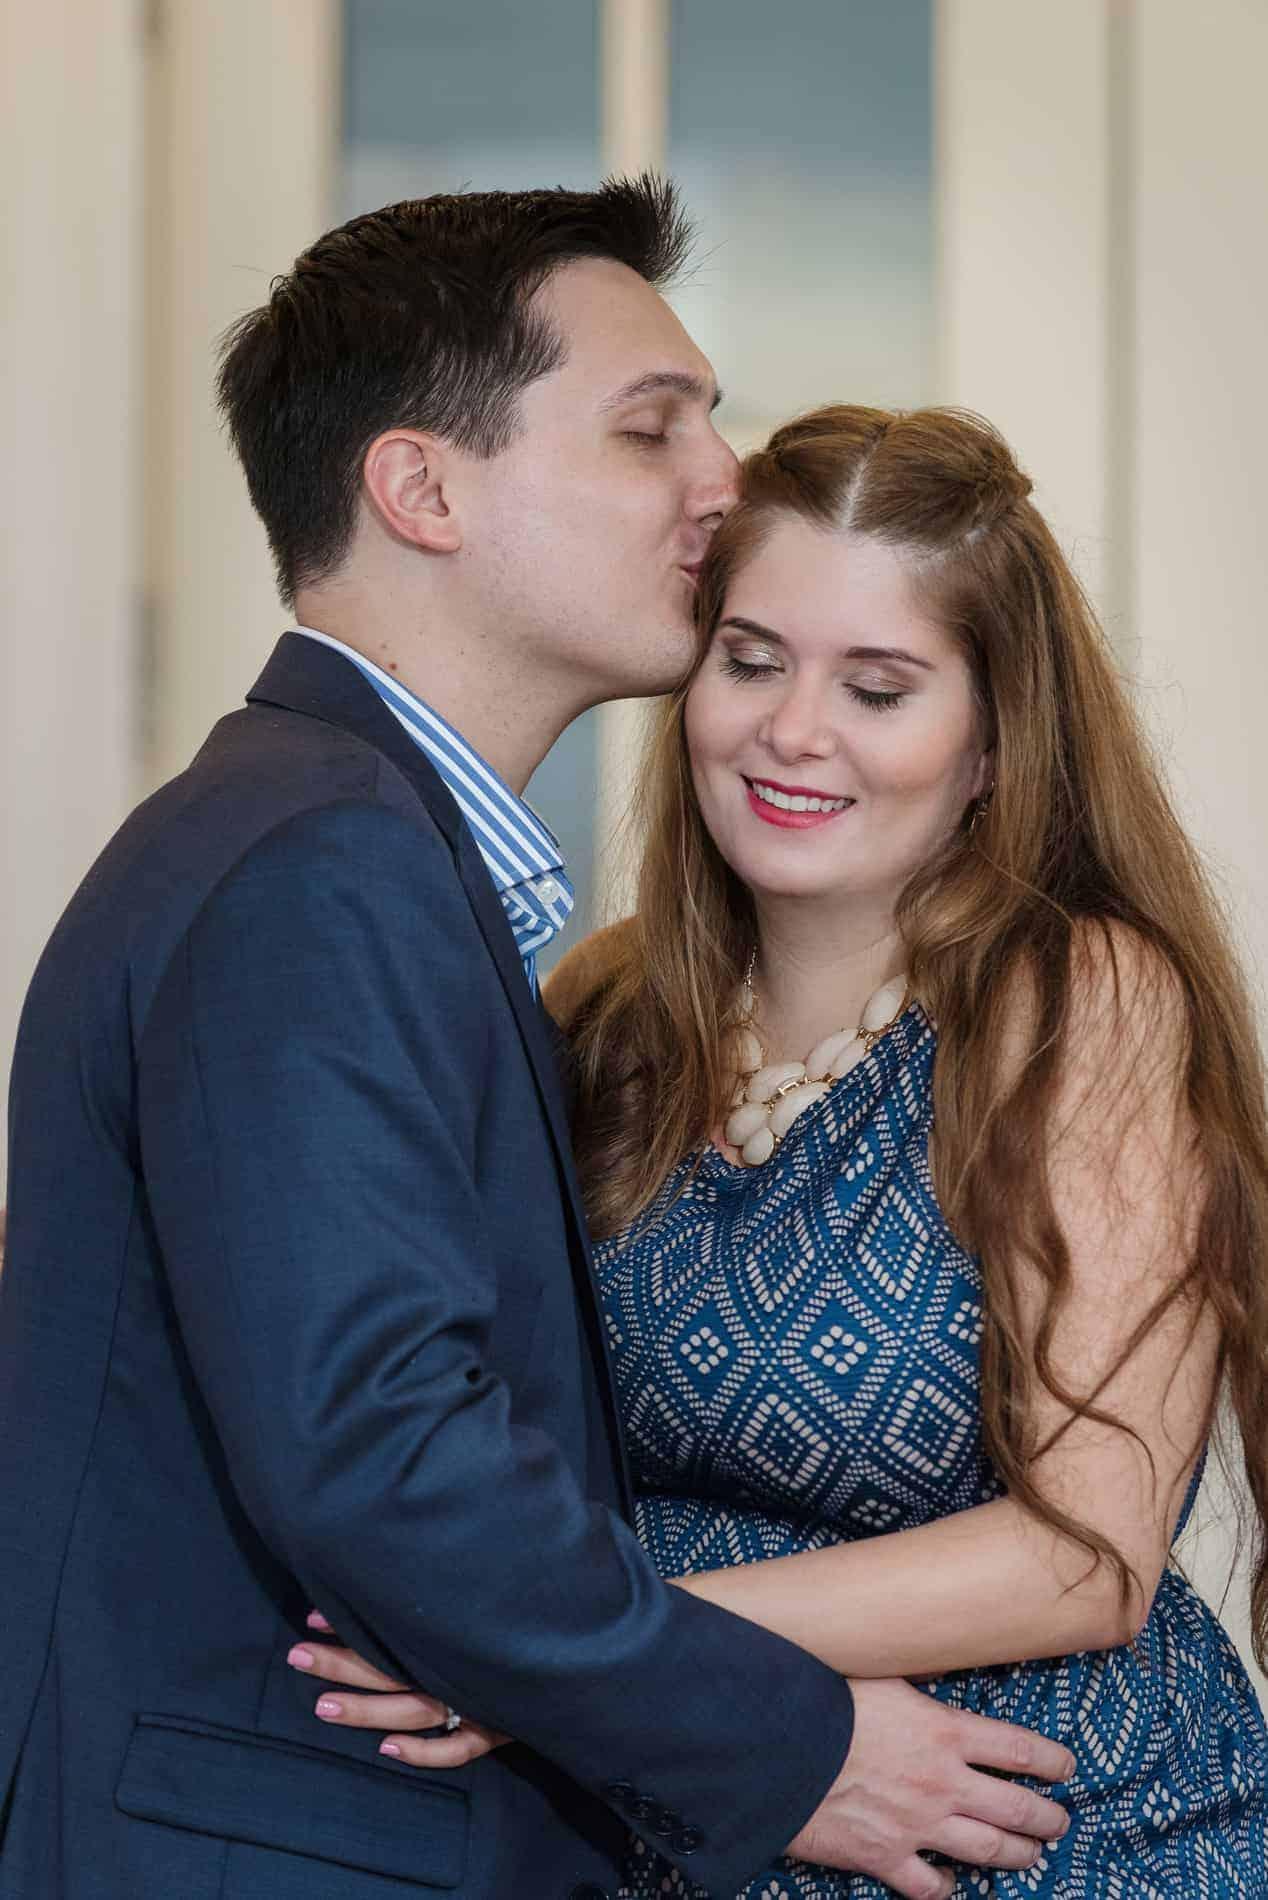 Engagement Photos at Disneys Boardwalk